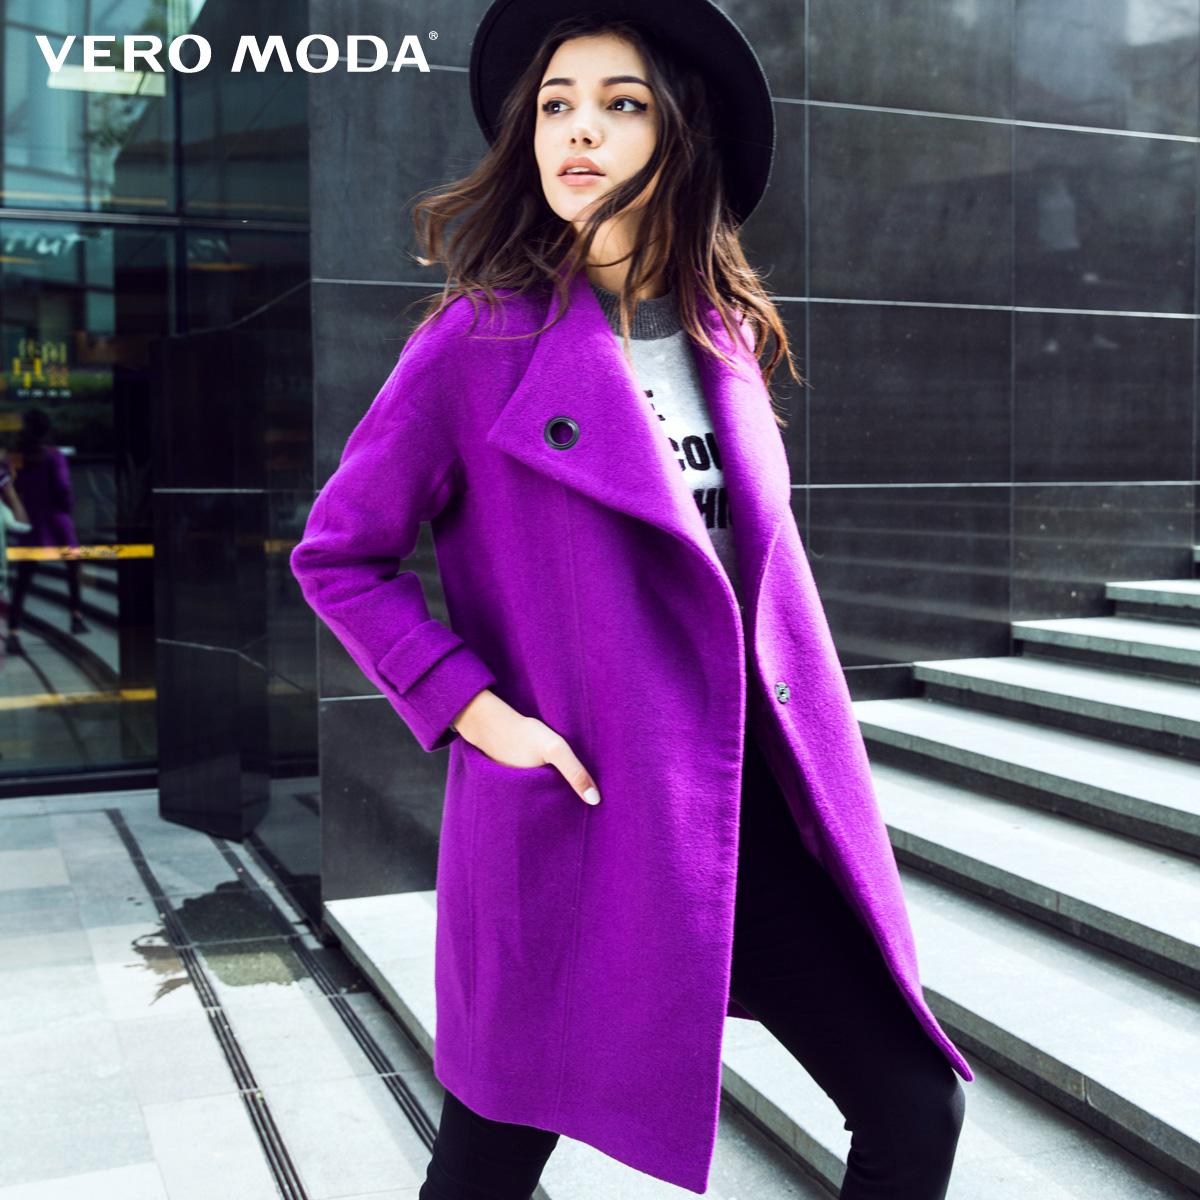 Vero Moda毛呢外套女装质量怎么样,是什么牌子